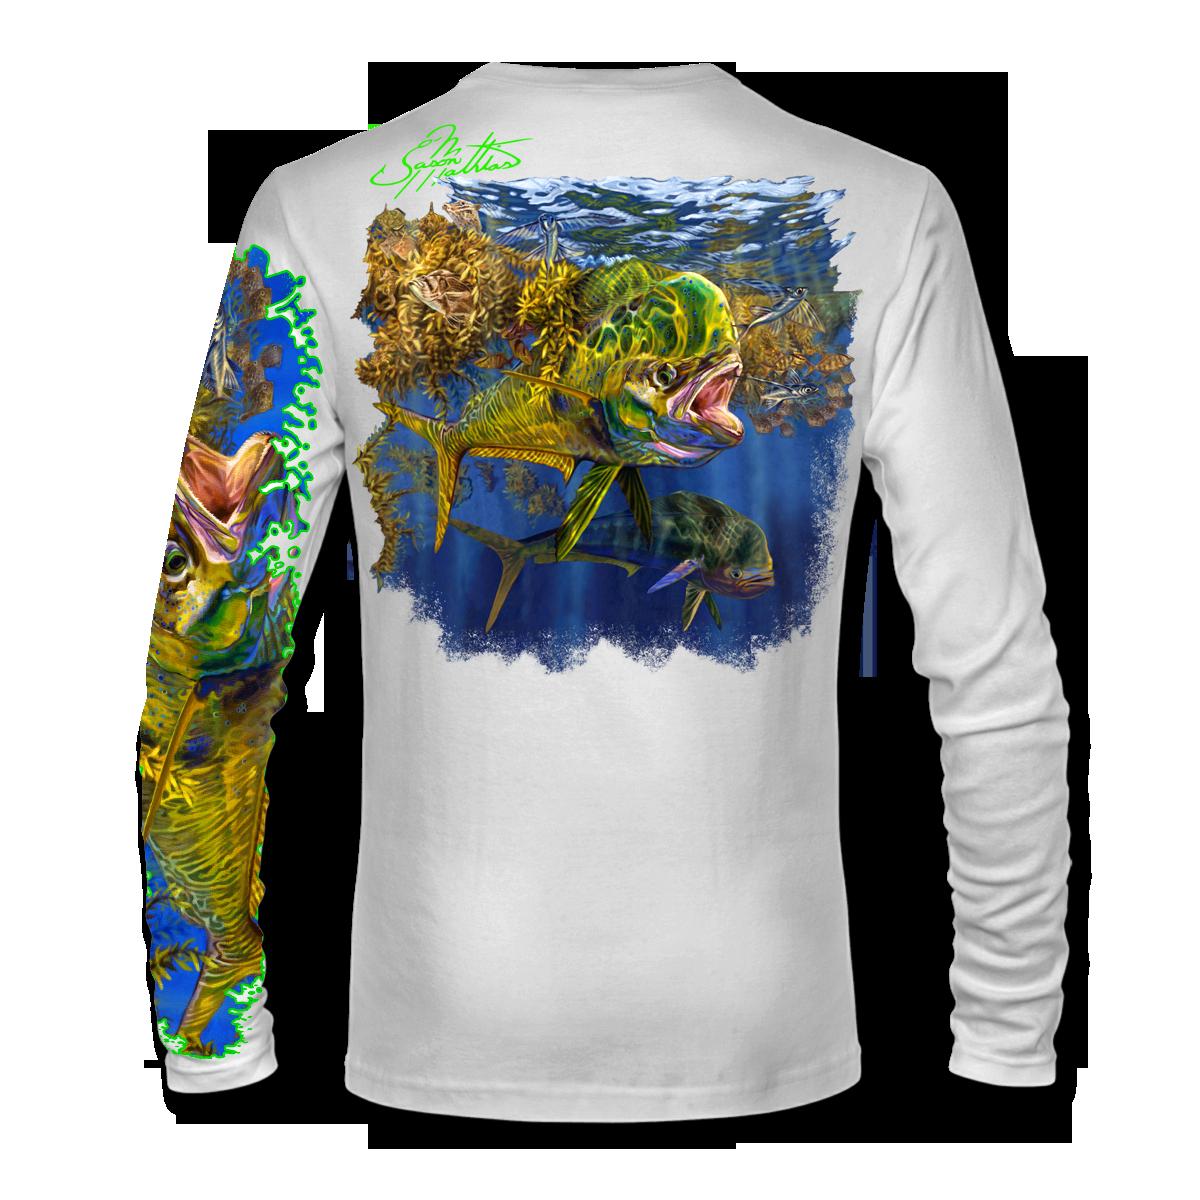 jason-mathias-white-shirt-mahi-mahi-dorado-dolphin-performance-shirt-t-shirt-fishing-apparel-clothing-offshore-gear.png